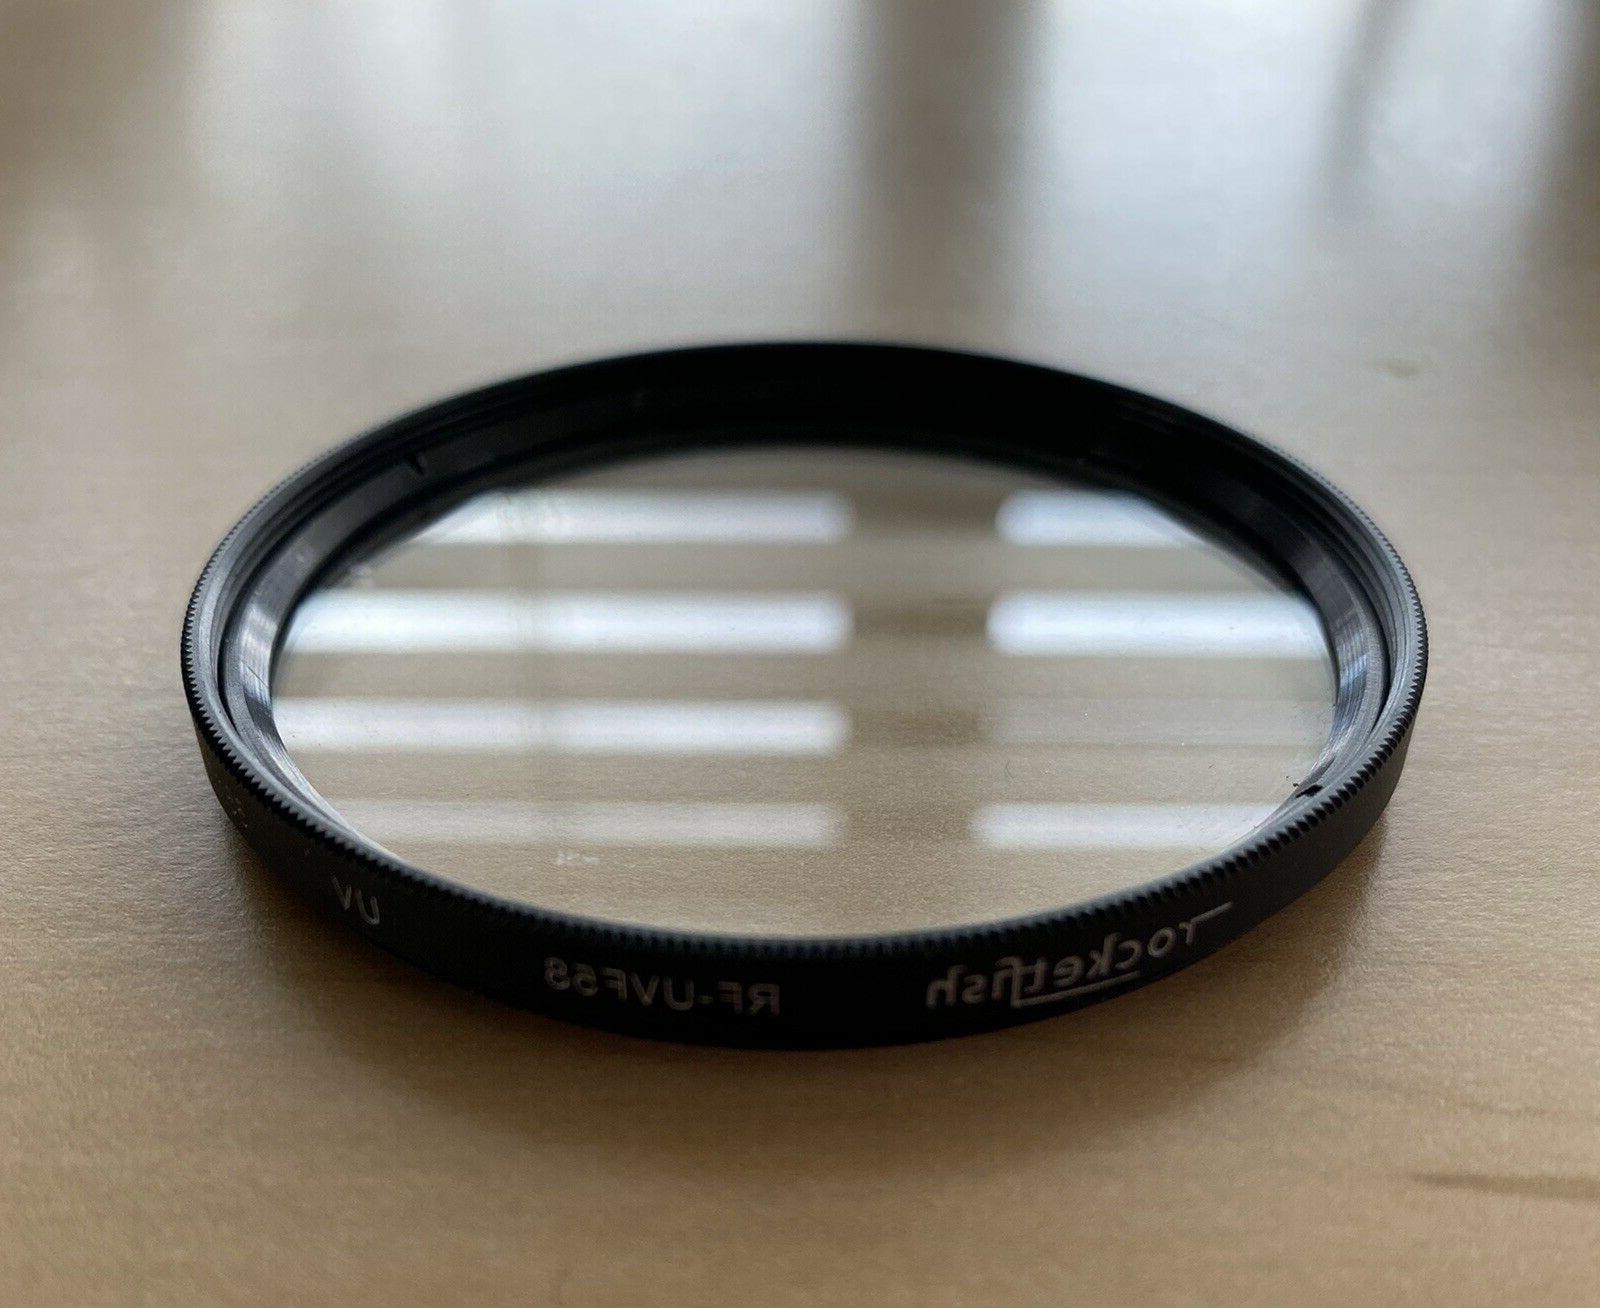 Canon Professional Video Camera Excellent Condition 6